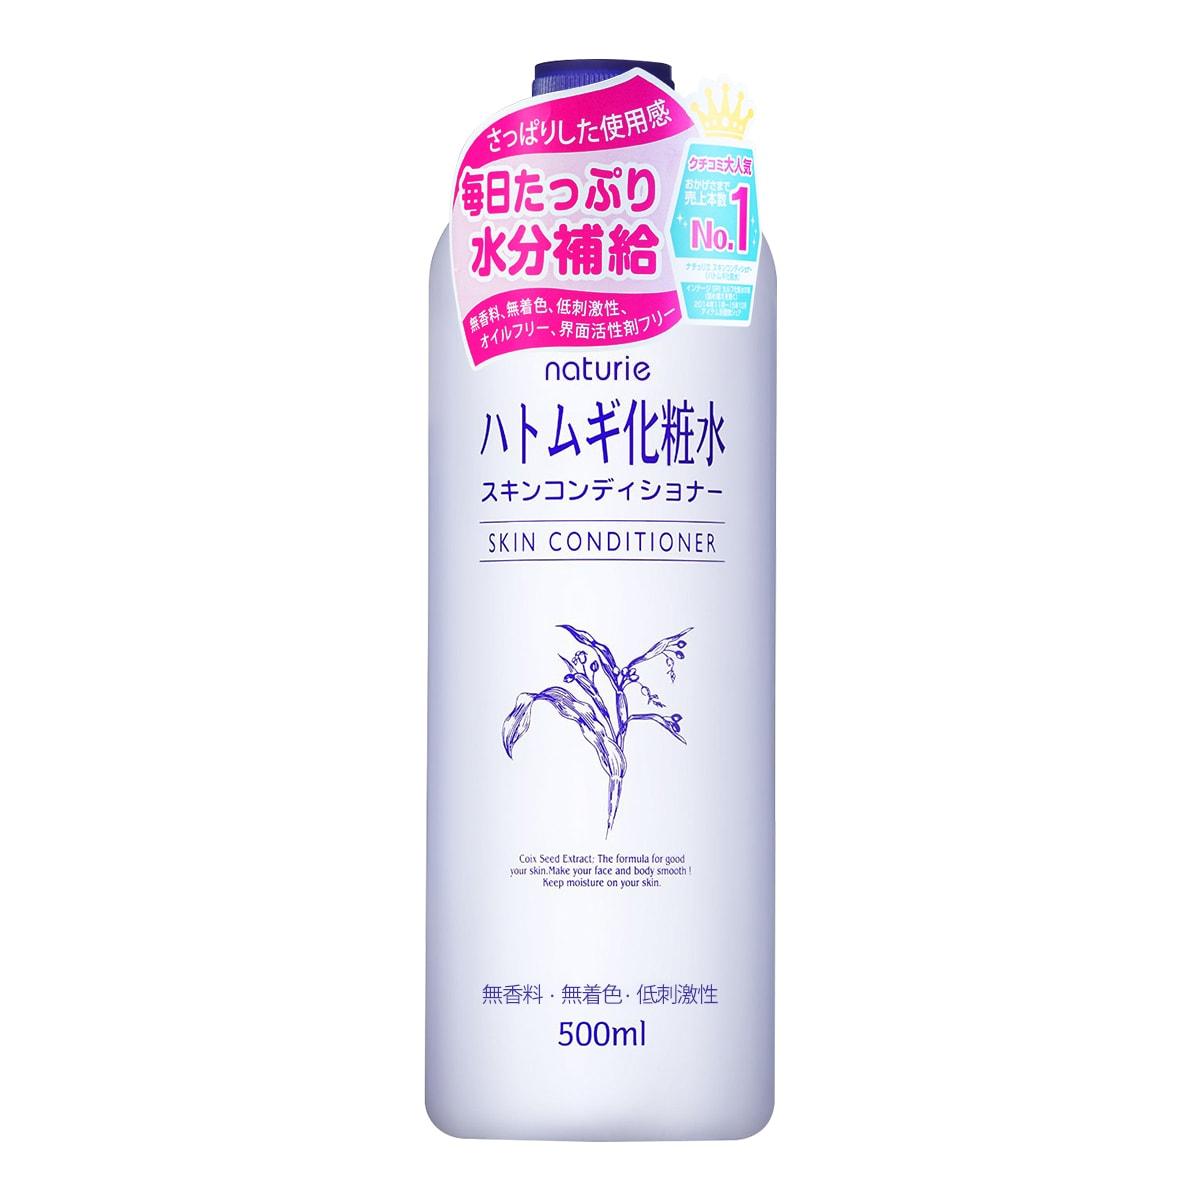 NATURIE Hatomugi Skin Conditioner/Toner 500ml